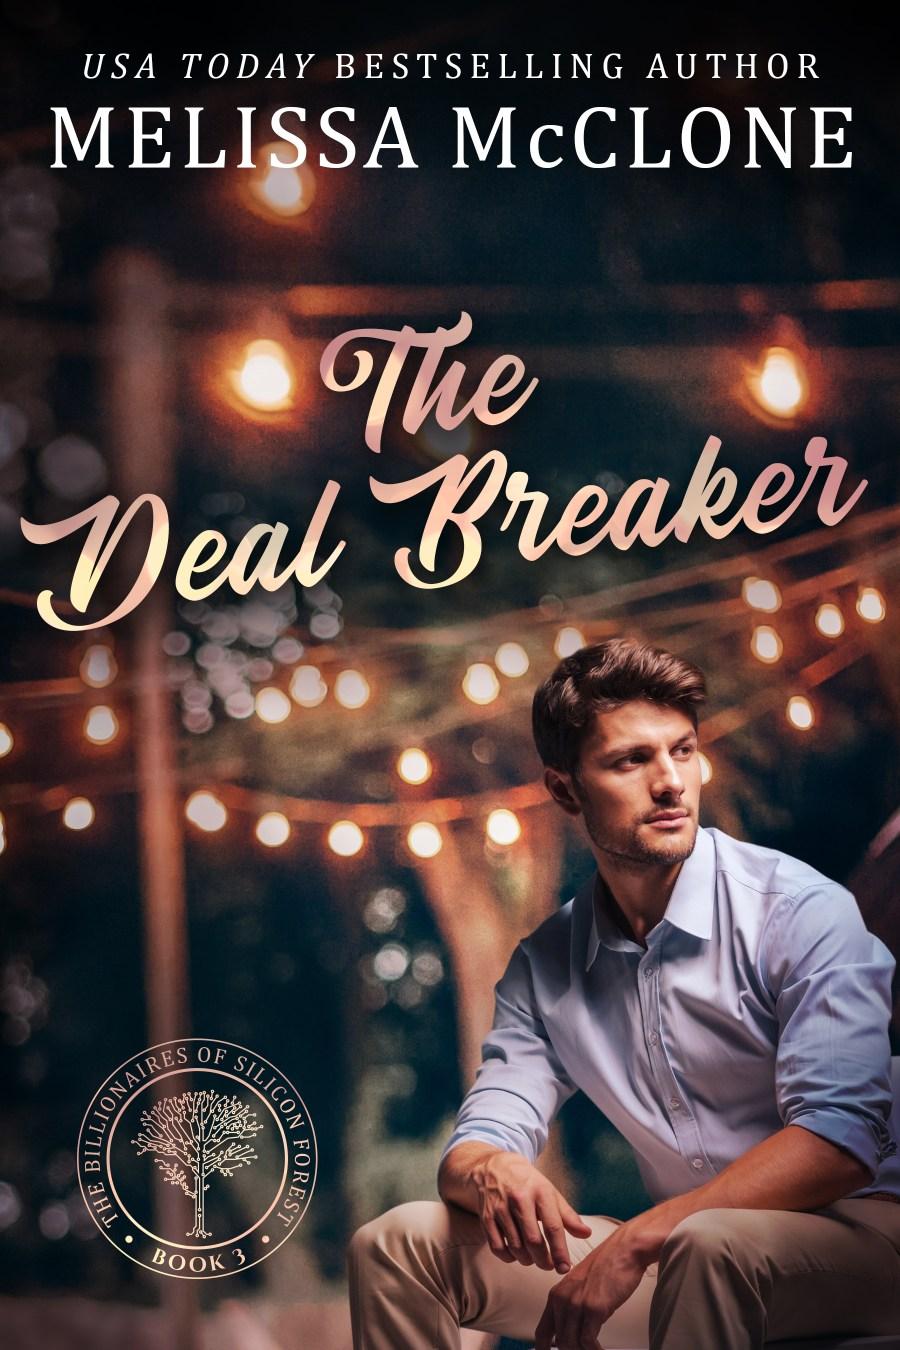 The Deal Breaker